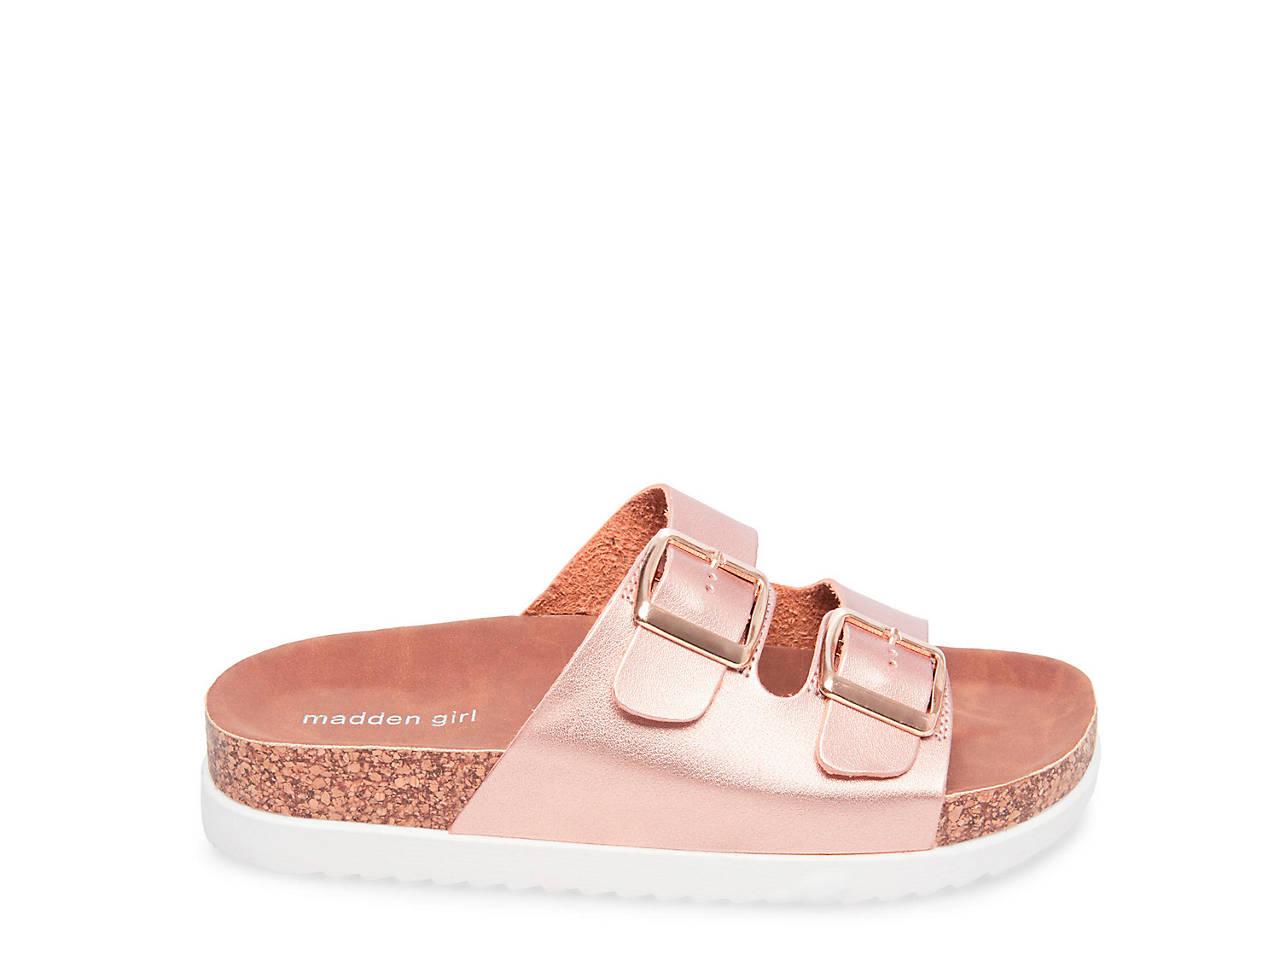 8b24c2ece84 Goldie Sandal